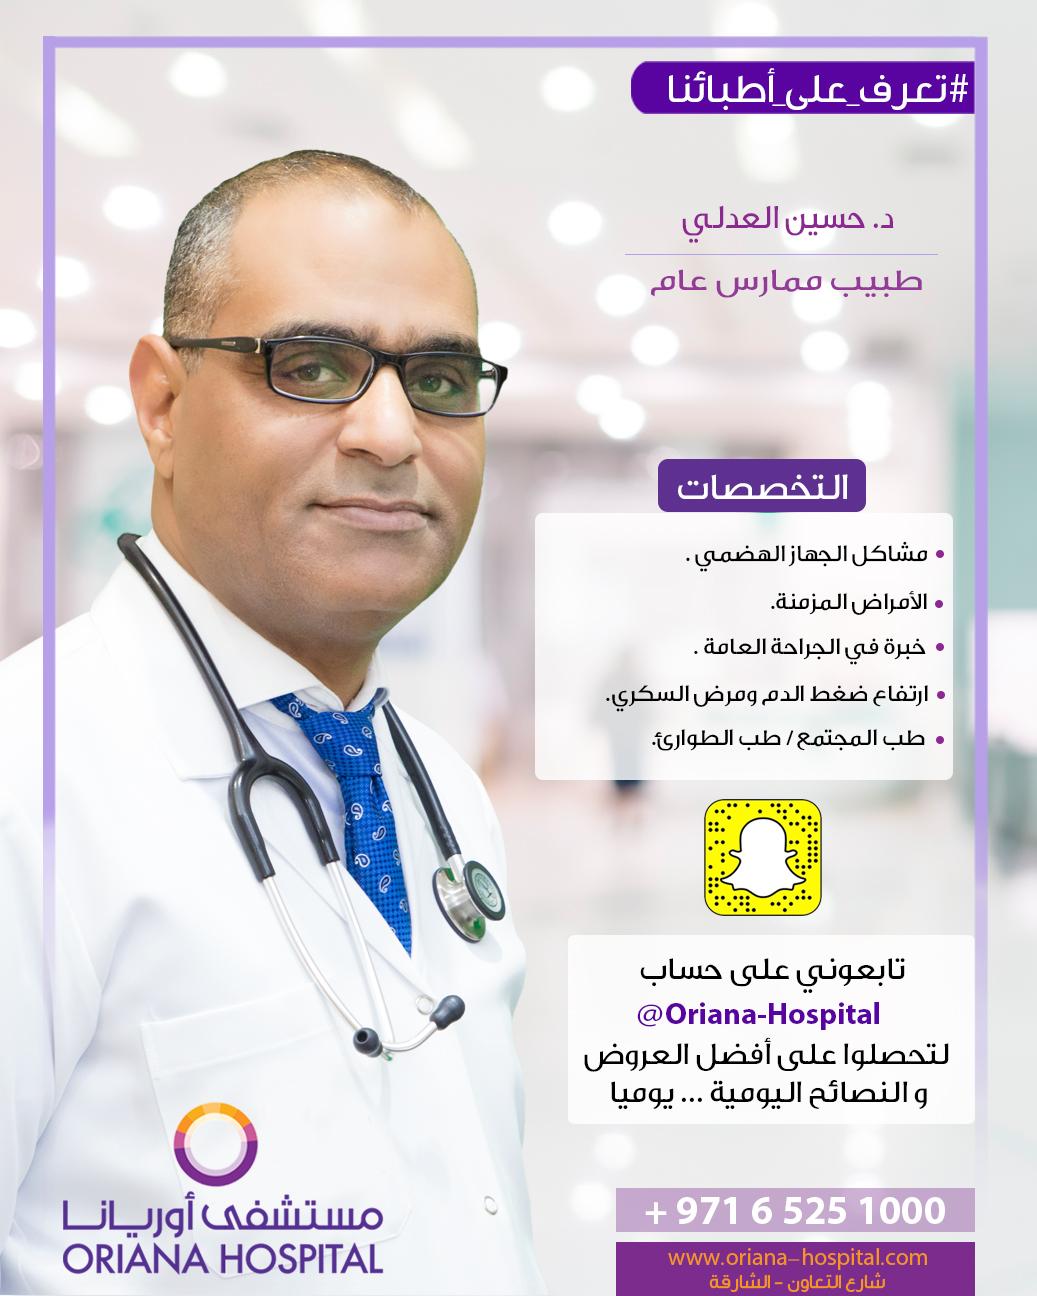 dr hussain arabic copy